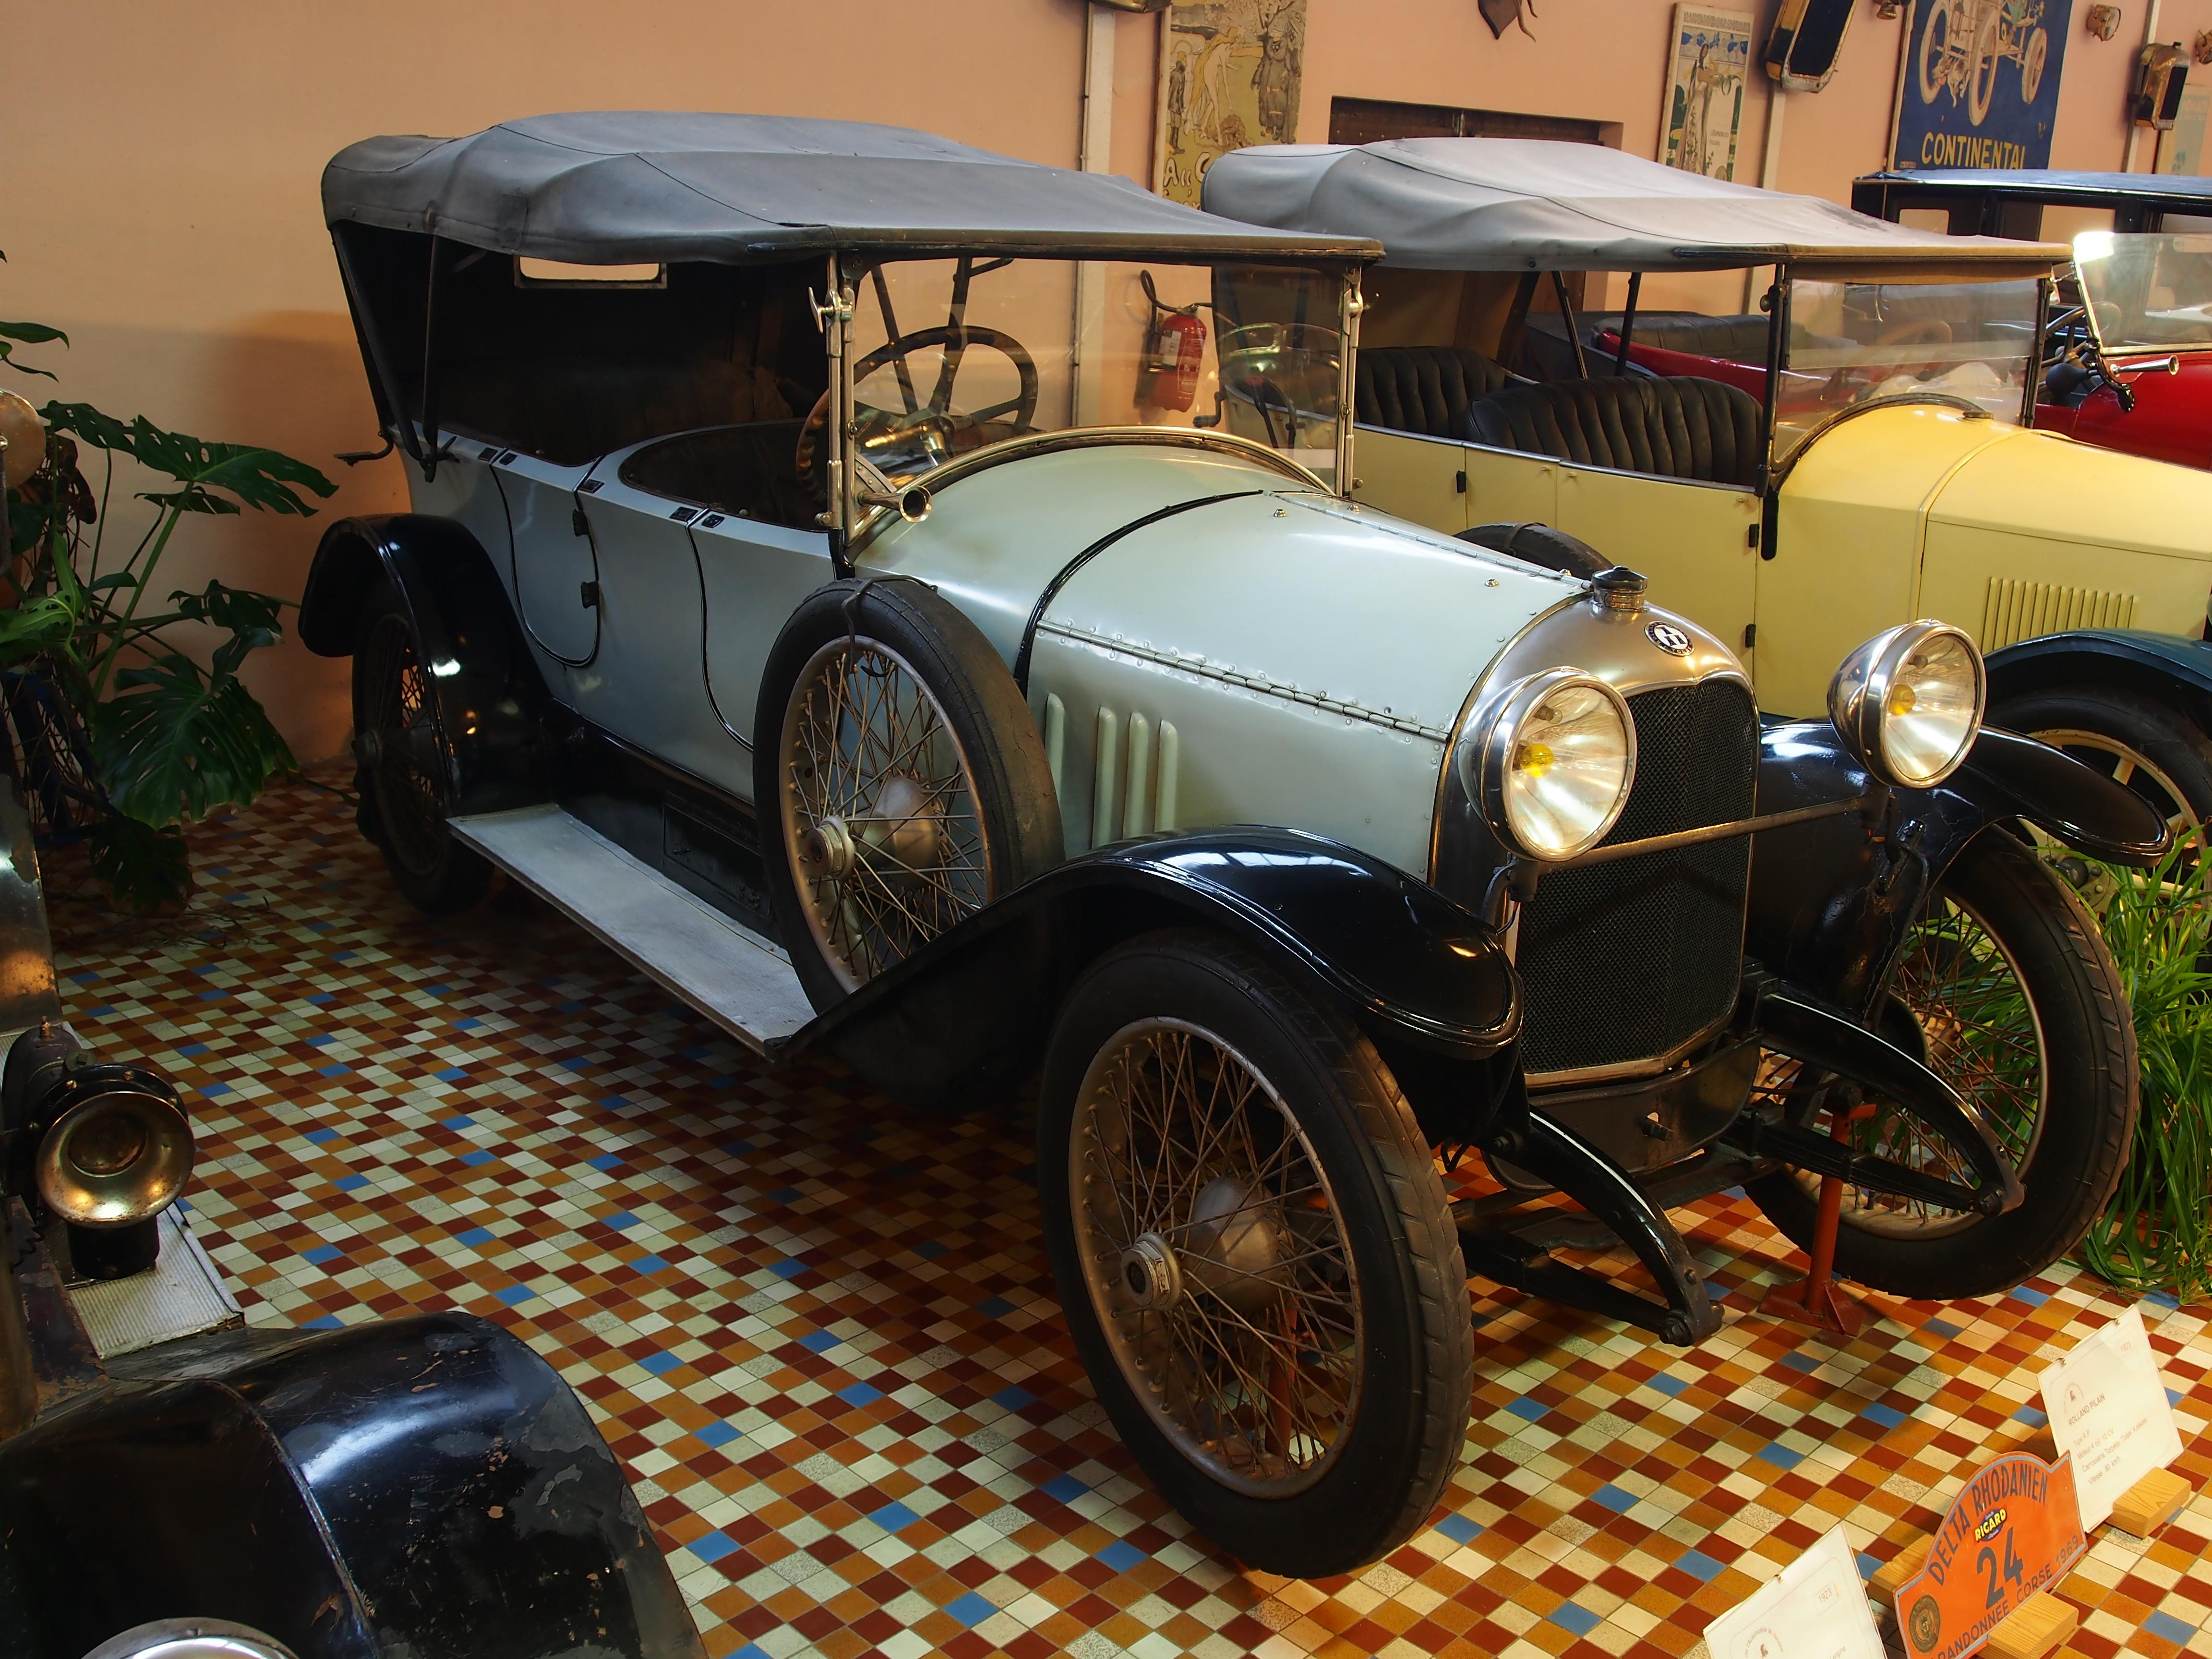 file 1923 rolland pilan r p four cylinder 10cv torpedo carosserie at the mus e automobile de. Black Bedroom Furniture Sets. Home Design Ideas